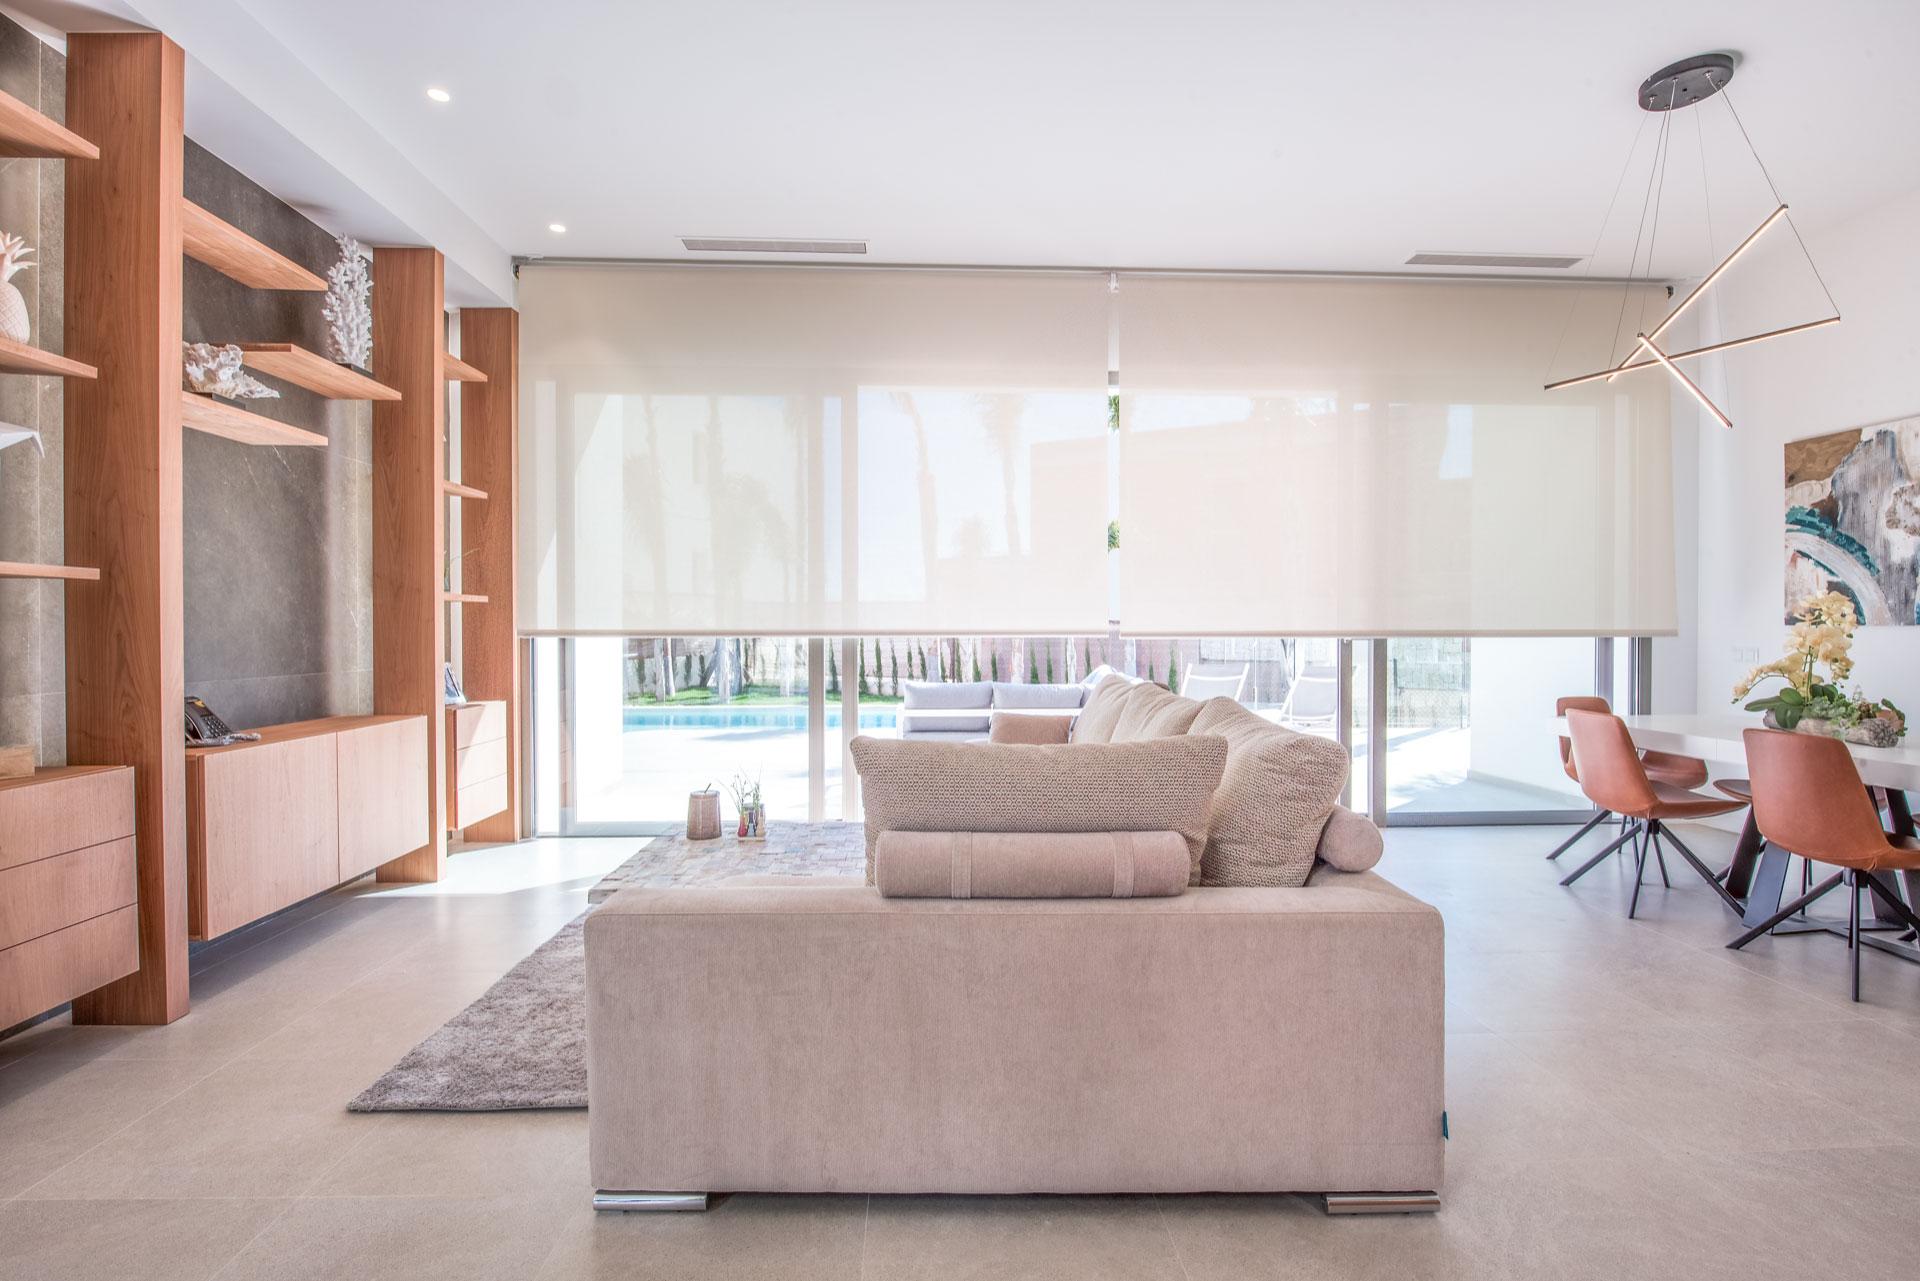 4 bedroom villa For Sale in Finestrat - photograph 3